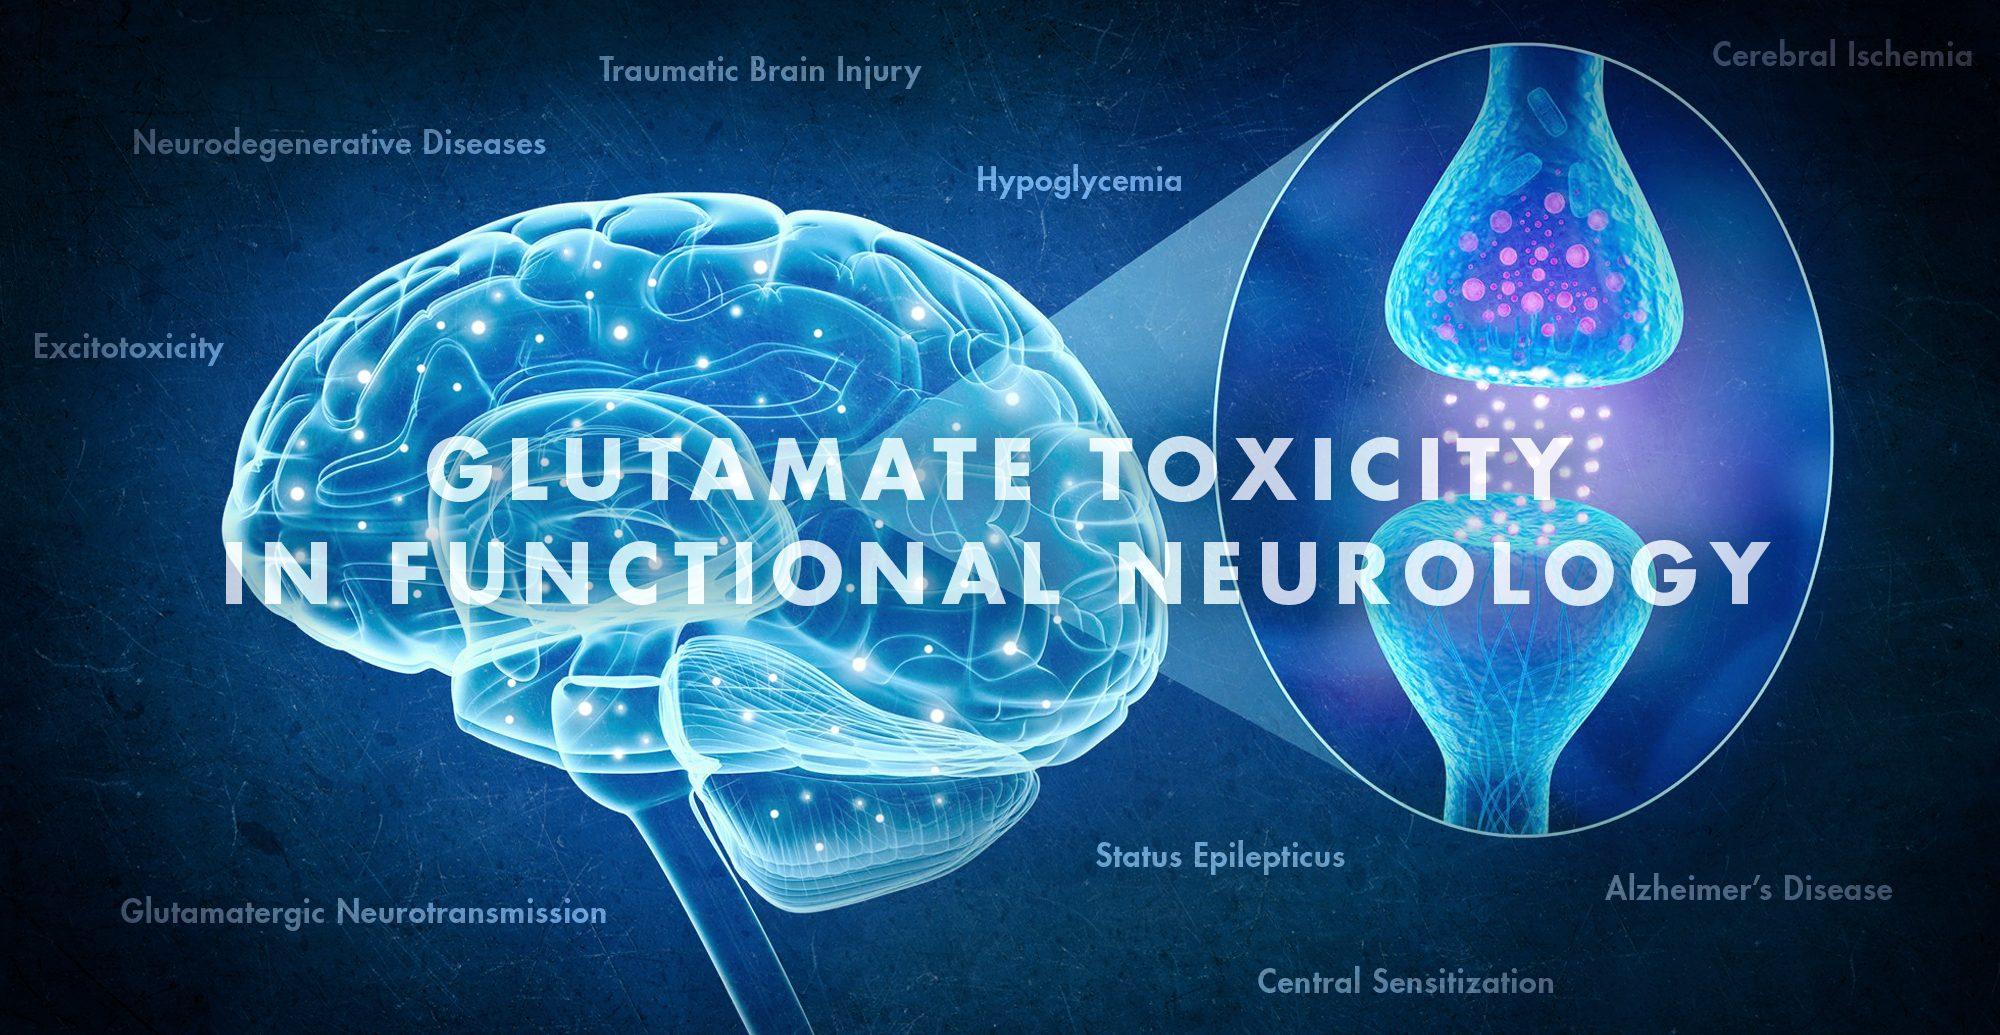 Toksisitas Glutamat dalam Neurologi Fungsional | El Paso, TX Chiropractor